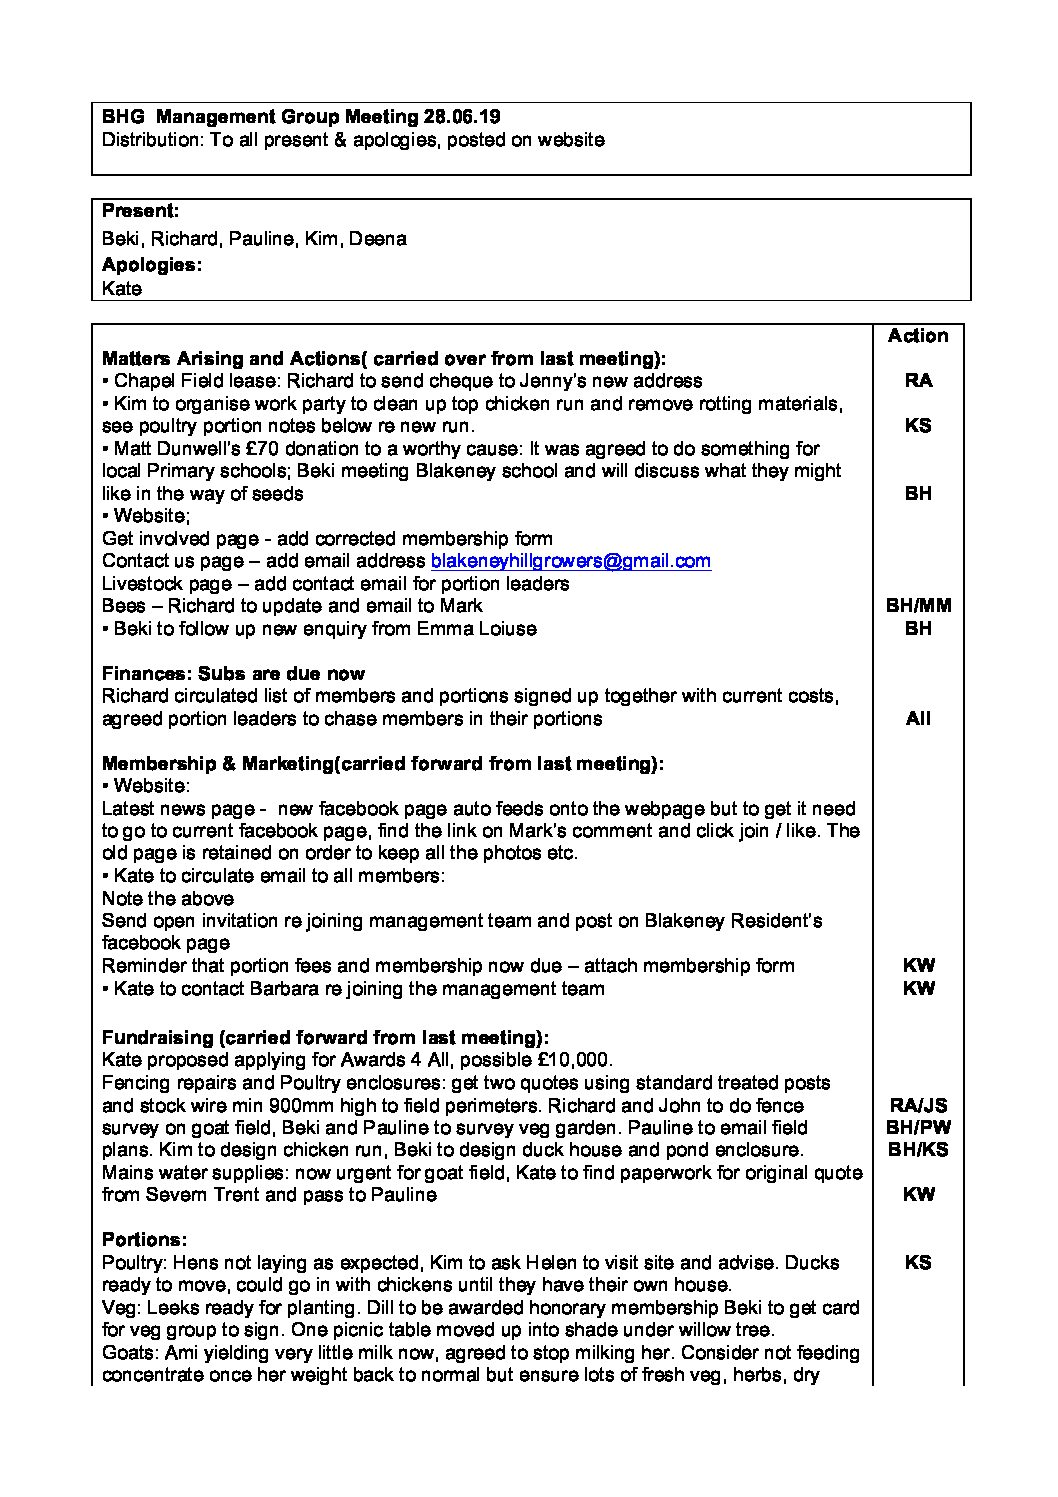 BHG-Minutes-28.06.19-pdf-1